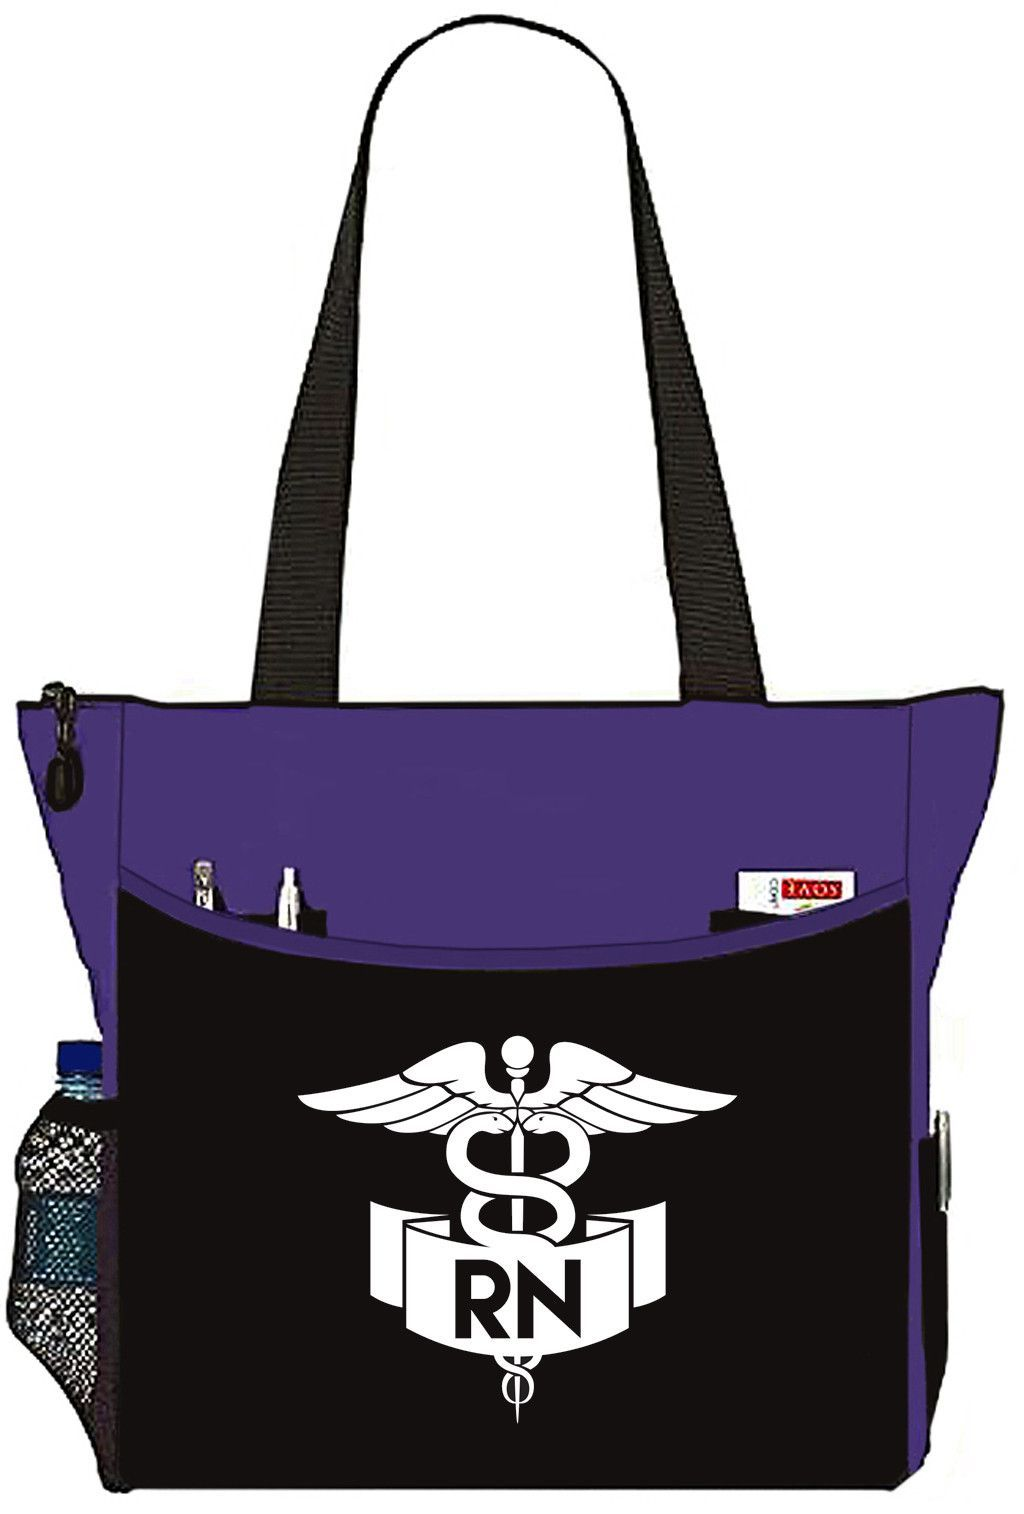 Purple Nurse Bag With Rn Banner Caduceus Tote Handbag Great Gifts For Nurses